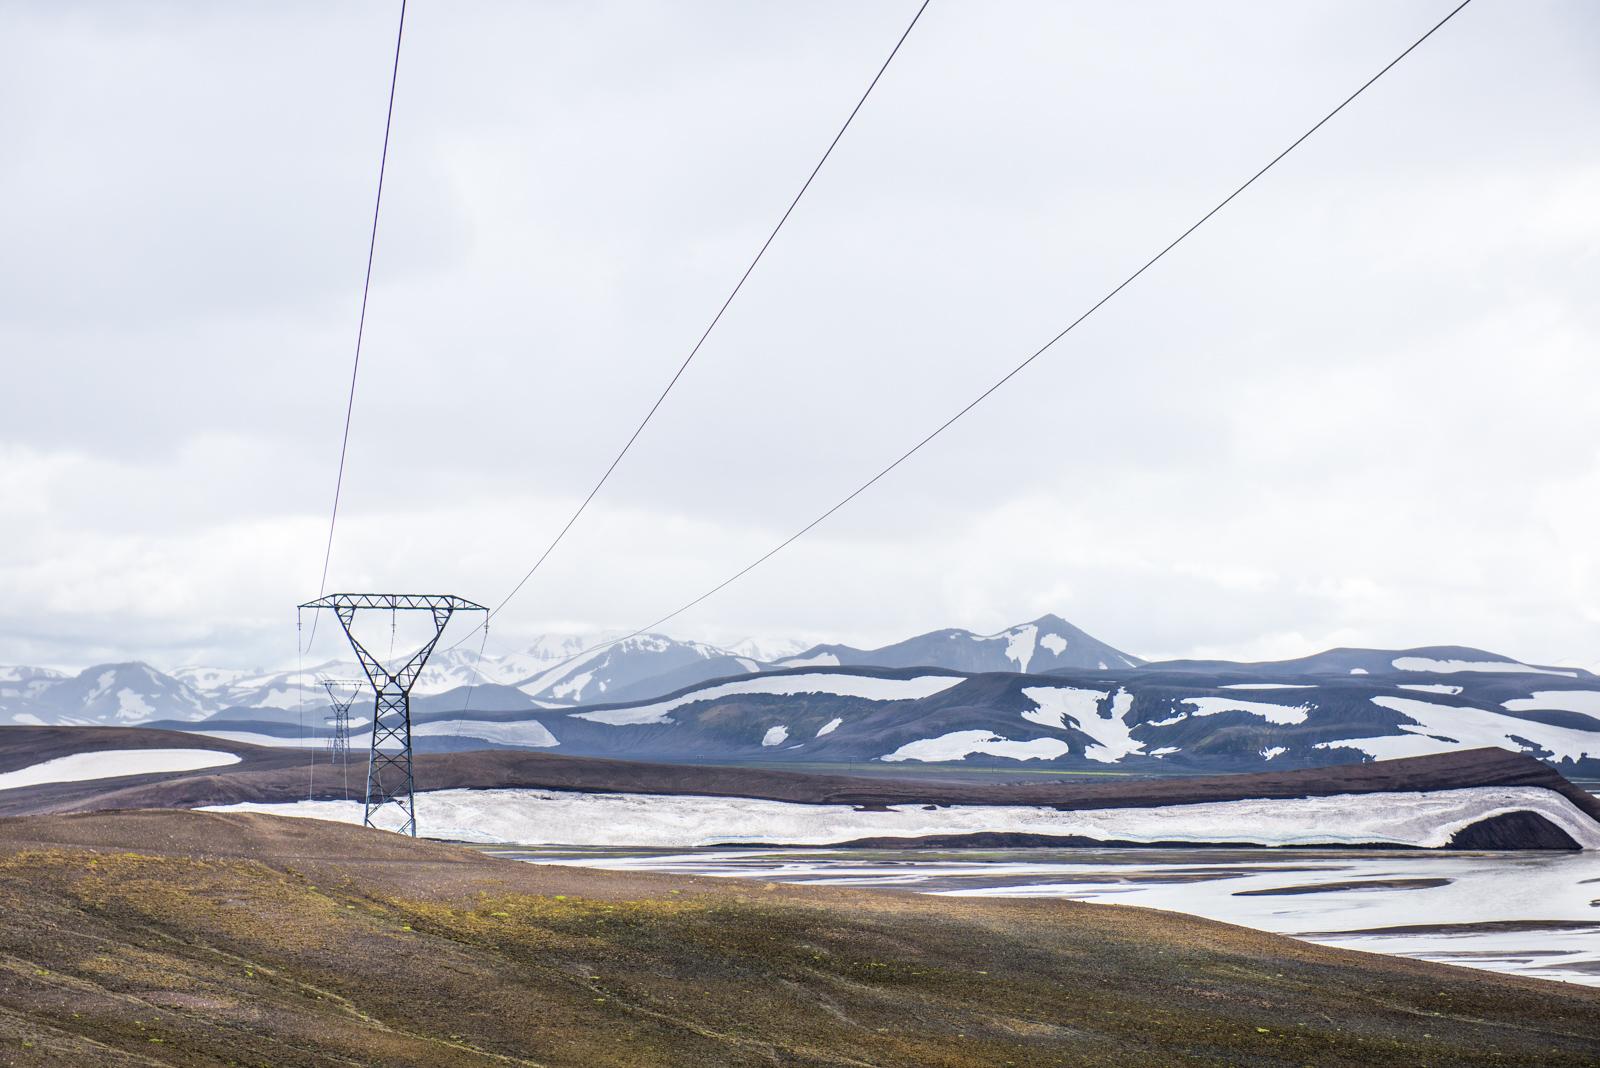 iceland_day_06_landmannalauger-23.jpg